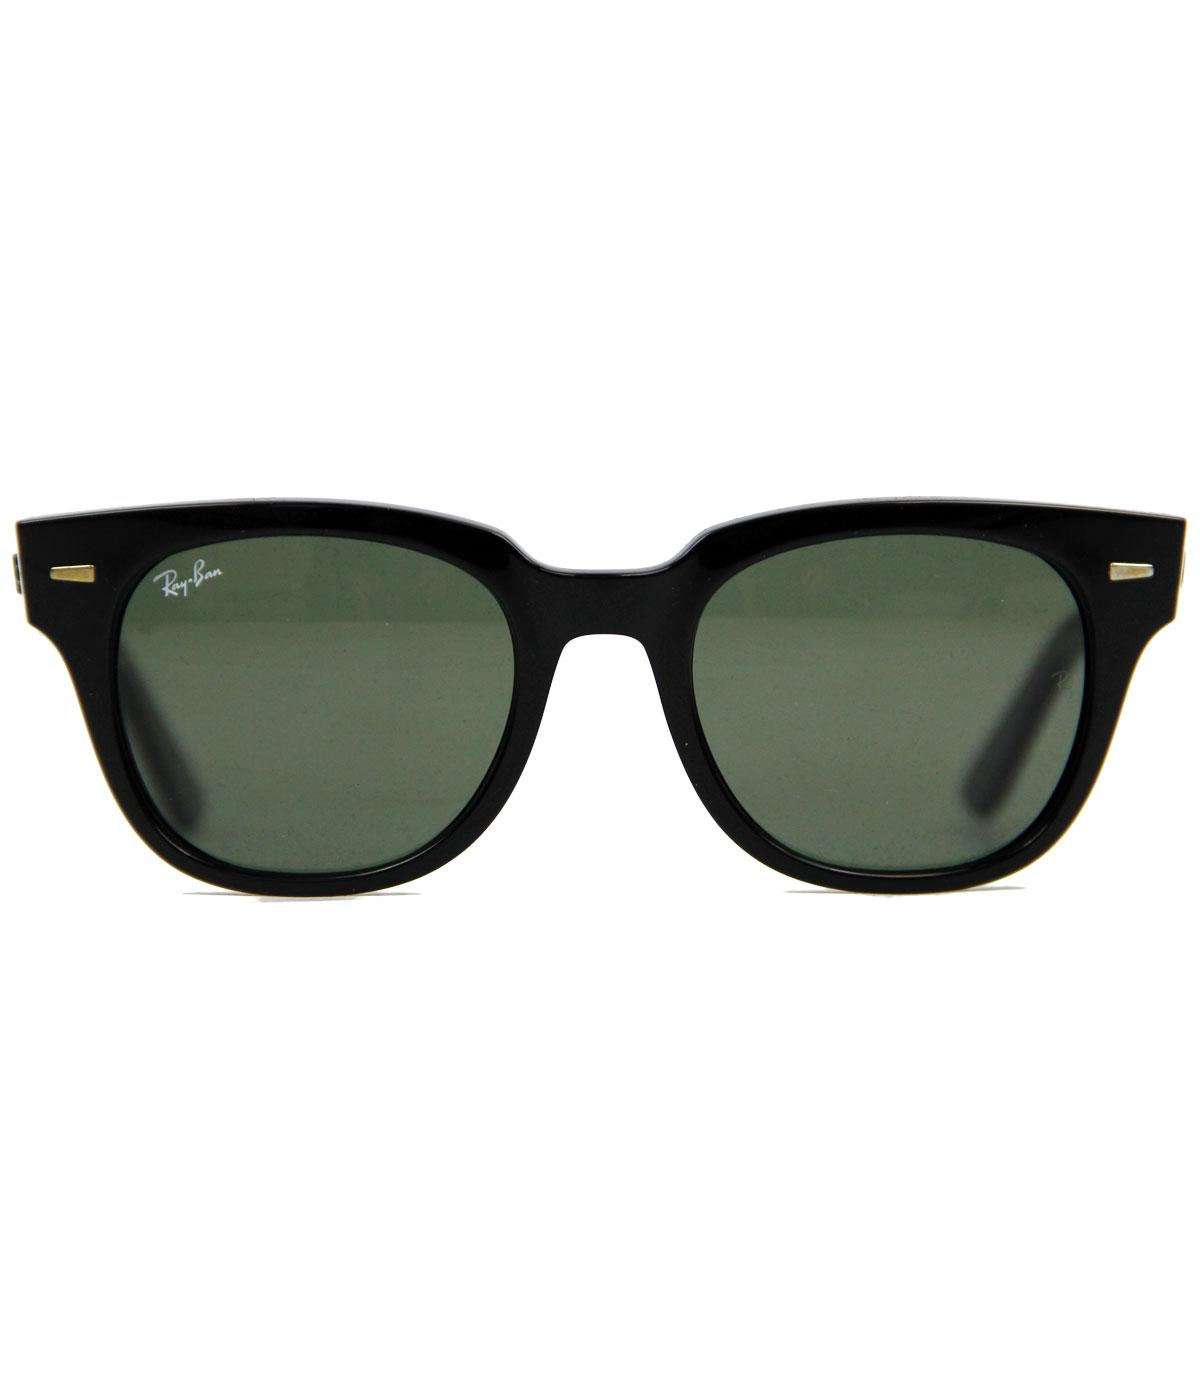 Ray Ban Wayfarer Sunglasses Meteor Retro Mens Mod PuOwiZkTX